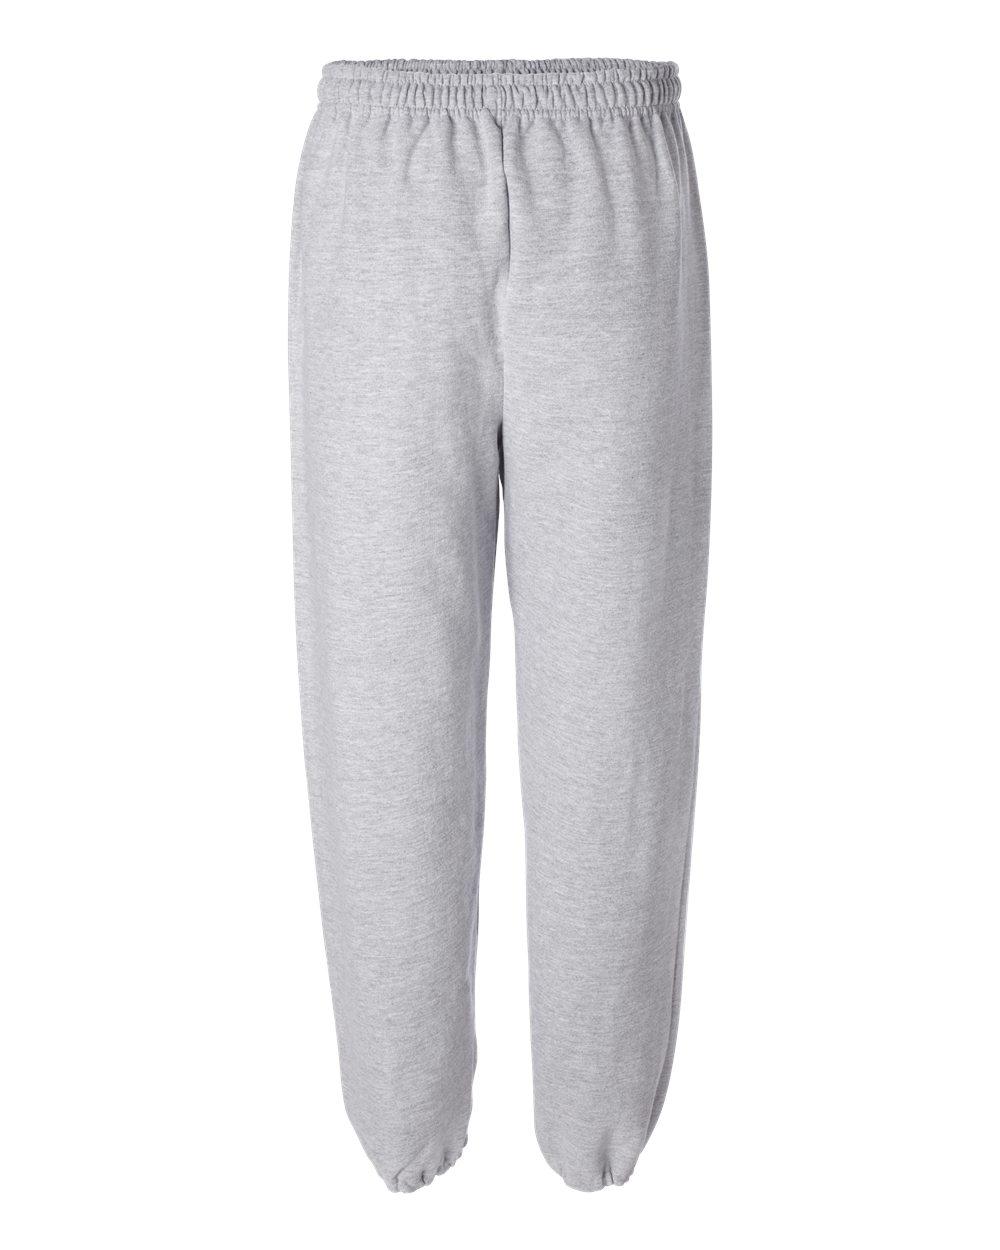 Gildan-Mens-Heavy-Blend-Sweatpants-18200-up-to-2XL thumbnail 16